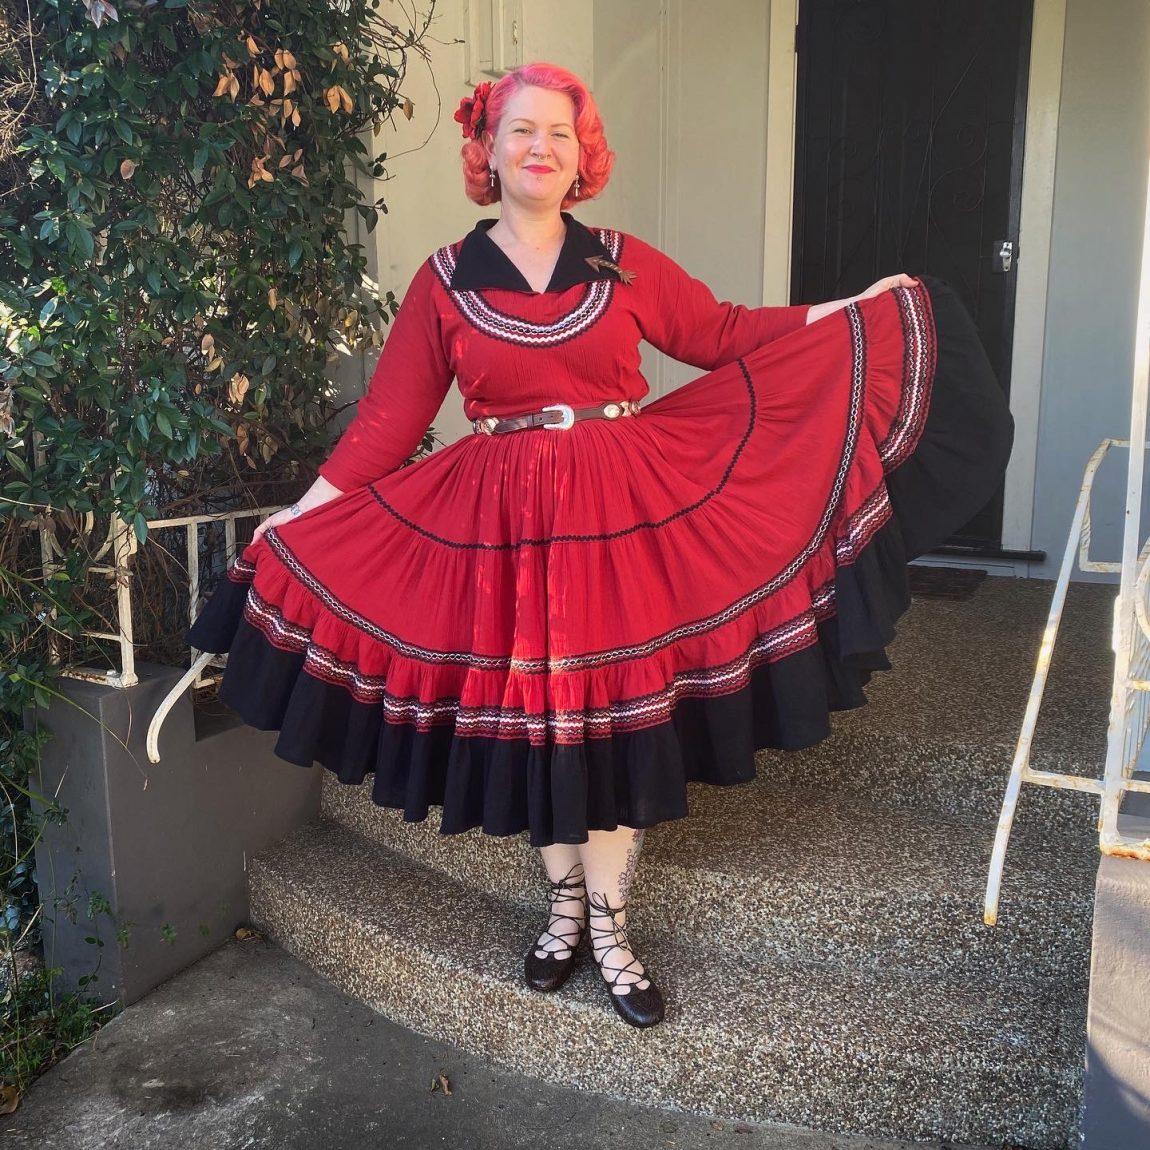 gertie jiffy dresses book patio dress red vintage 1950s fiesta dress